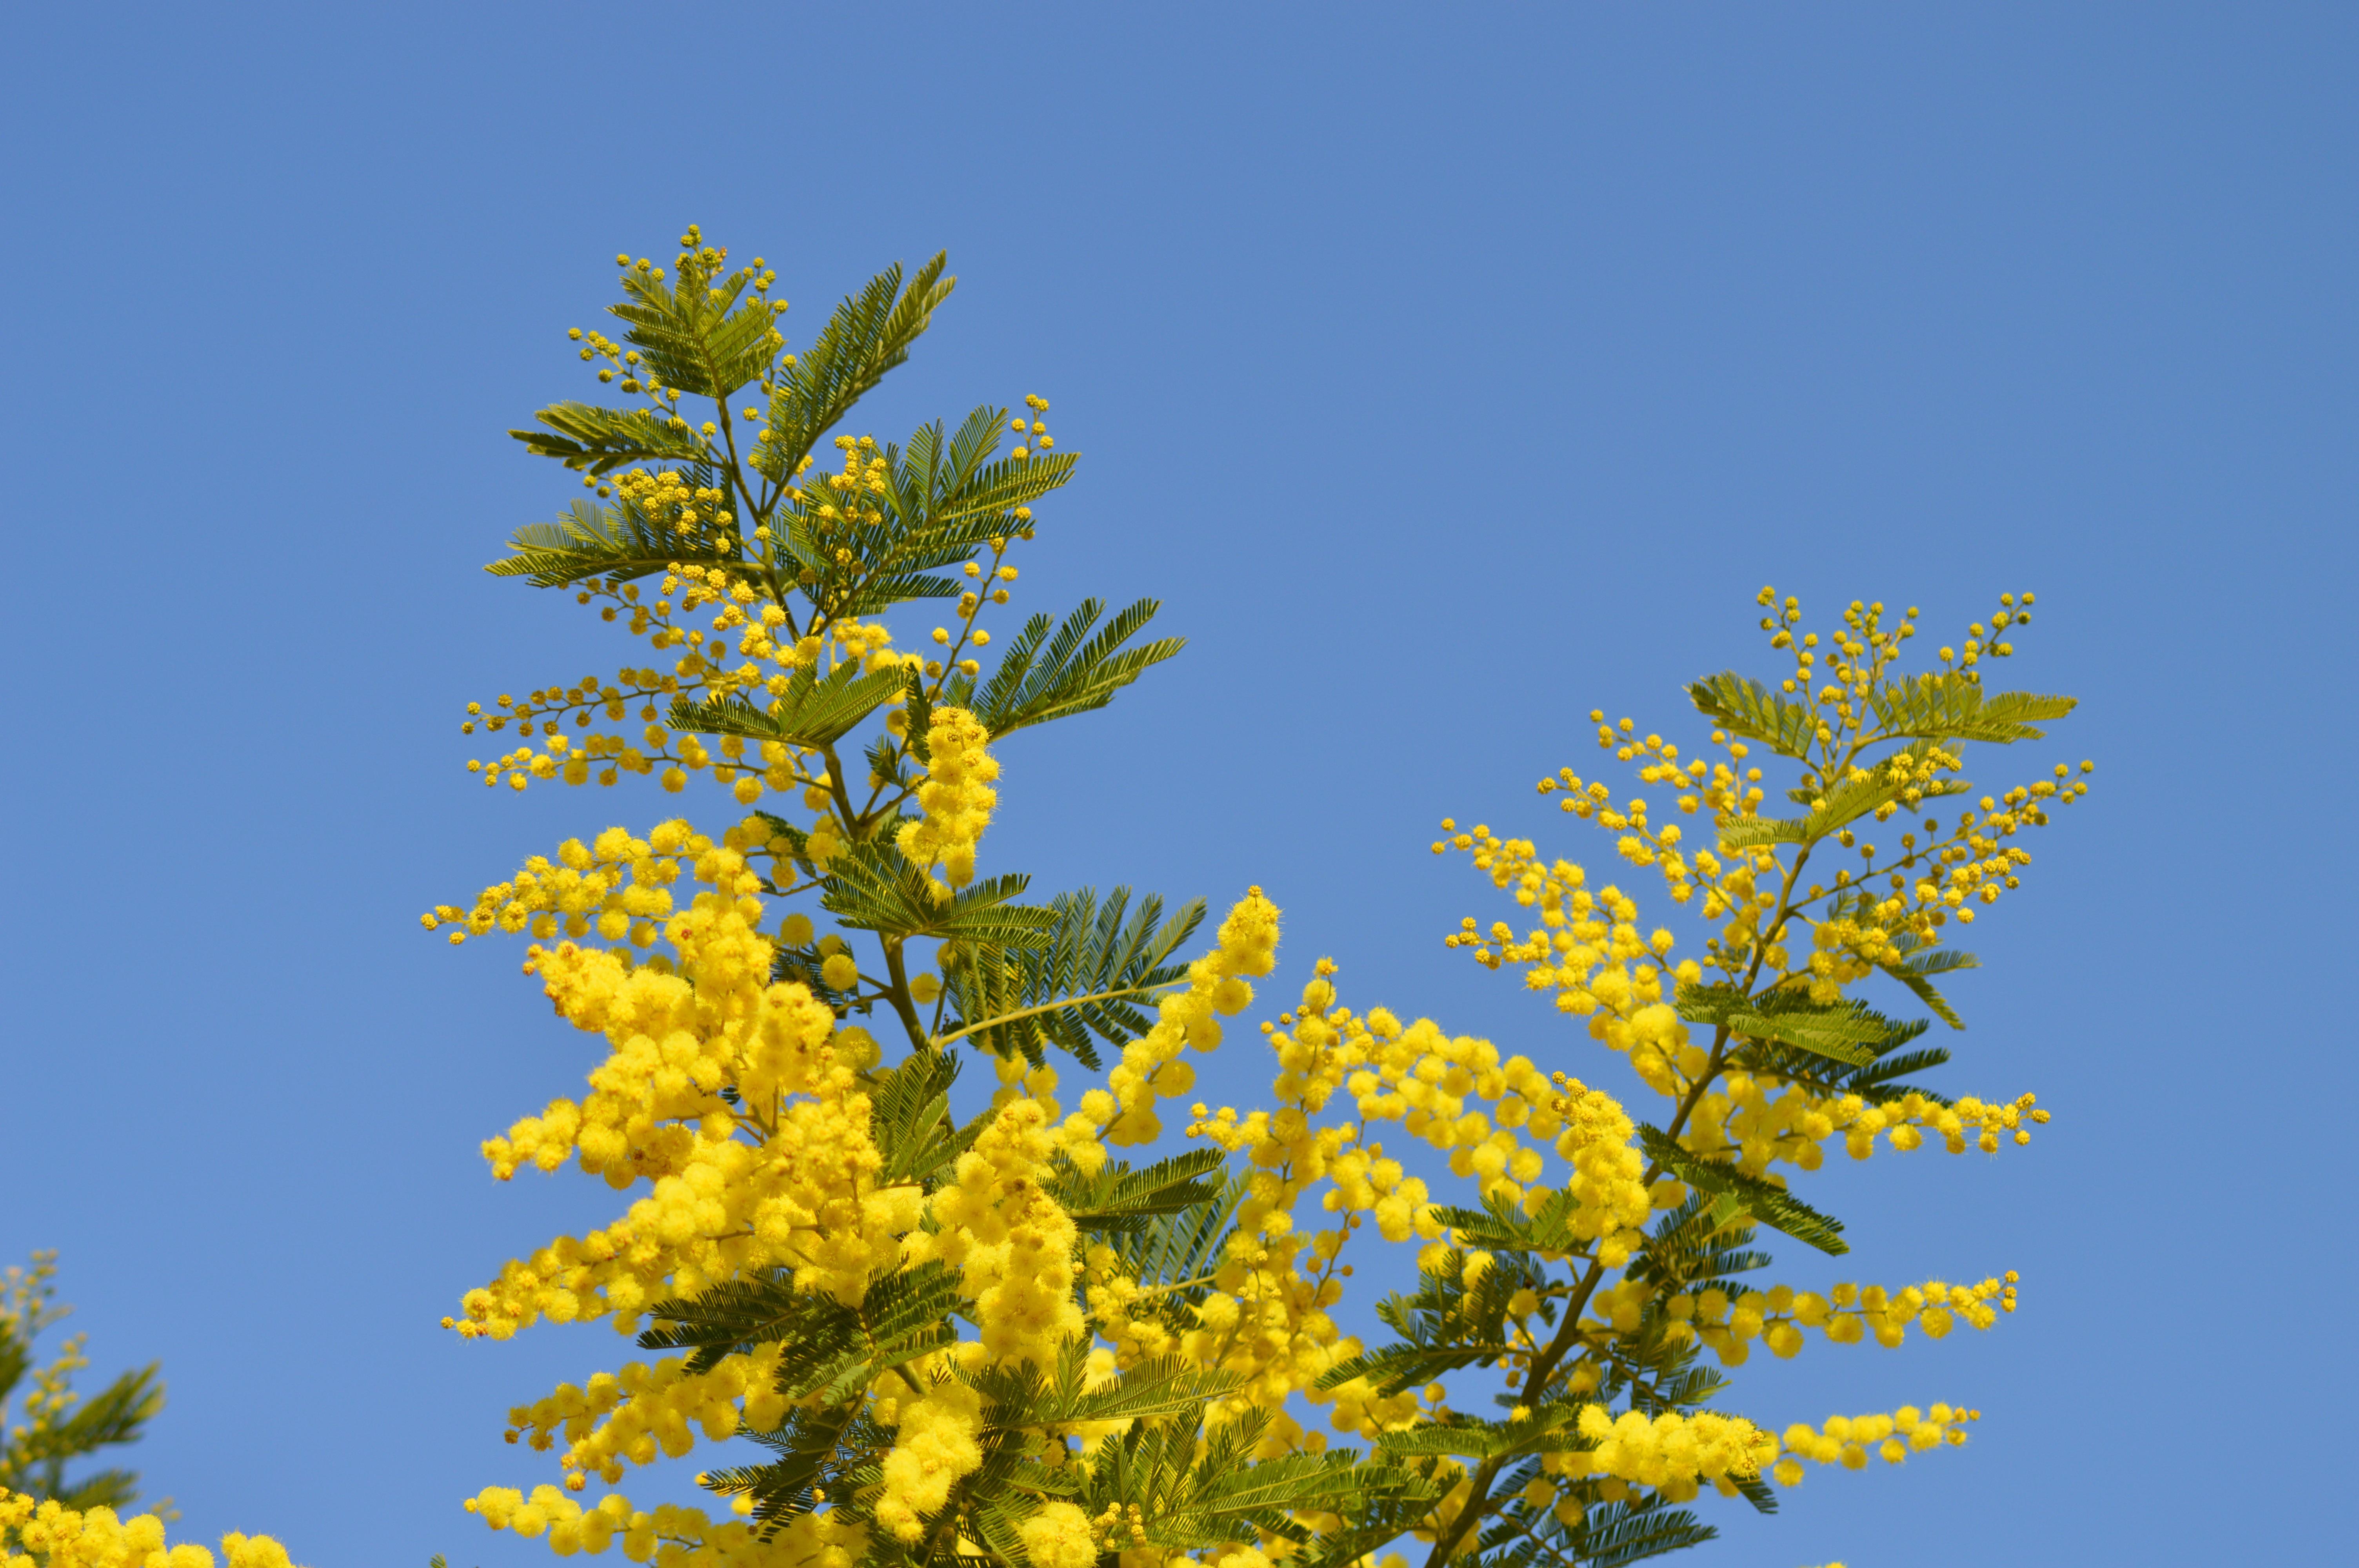 images gratuites mimosa fleurs fleur jaune france jardin provence 6016x4000 1369040. Black Bedroom Furniture Sets. Home Design Ideas